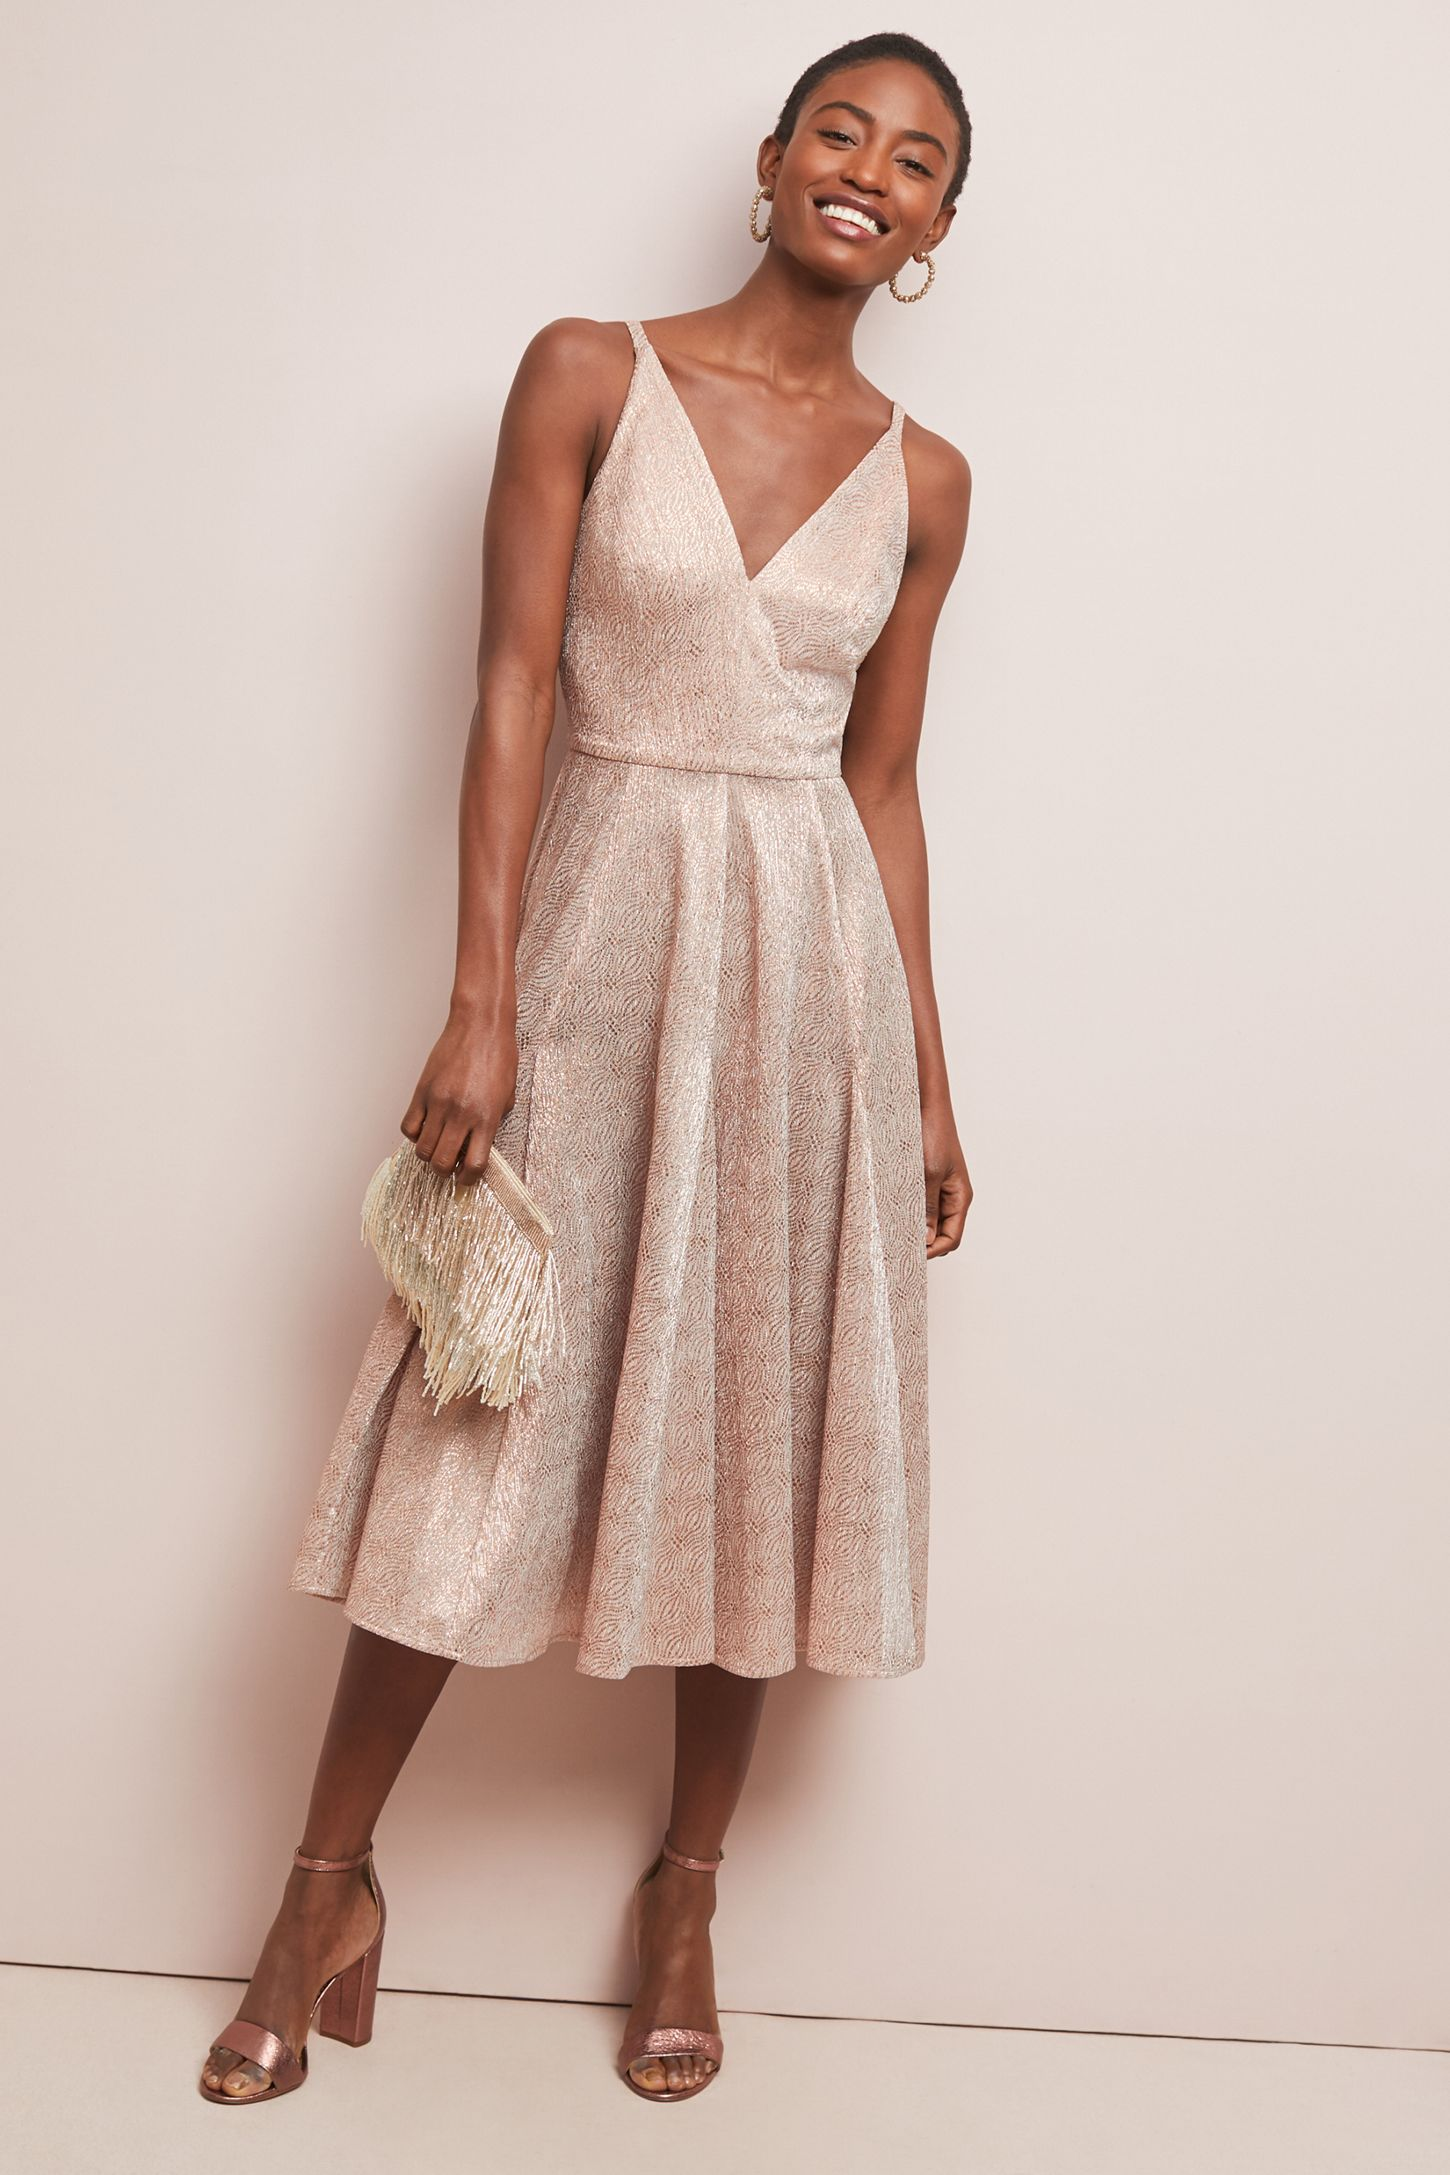 dress the population loreley dress